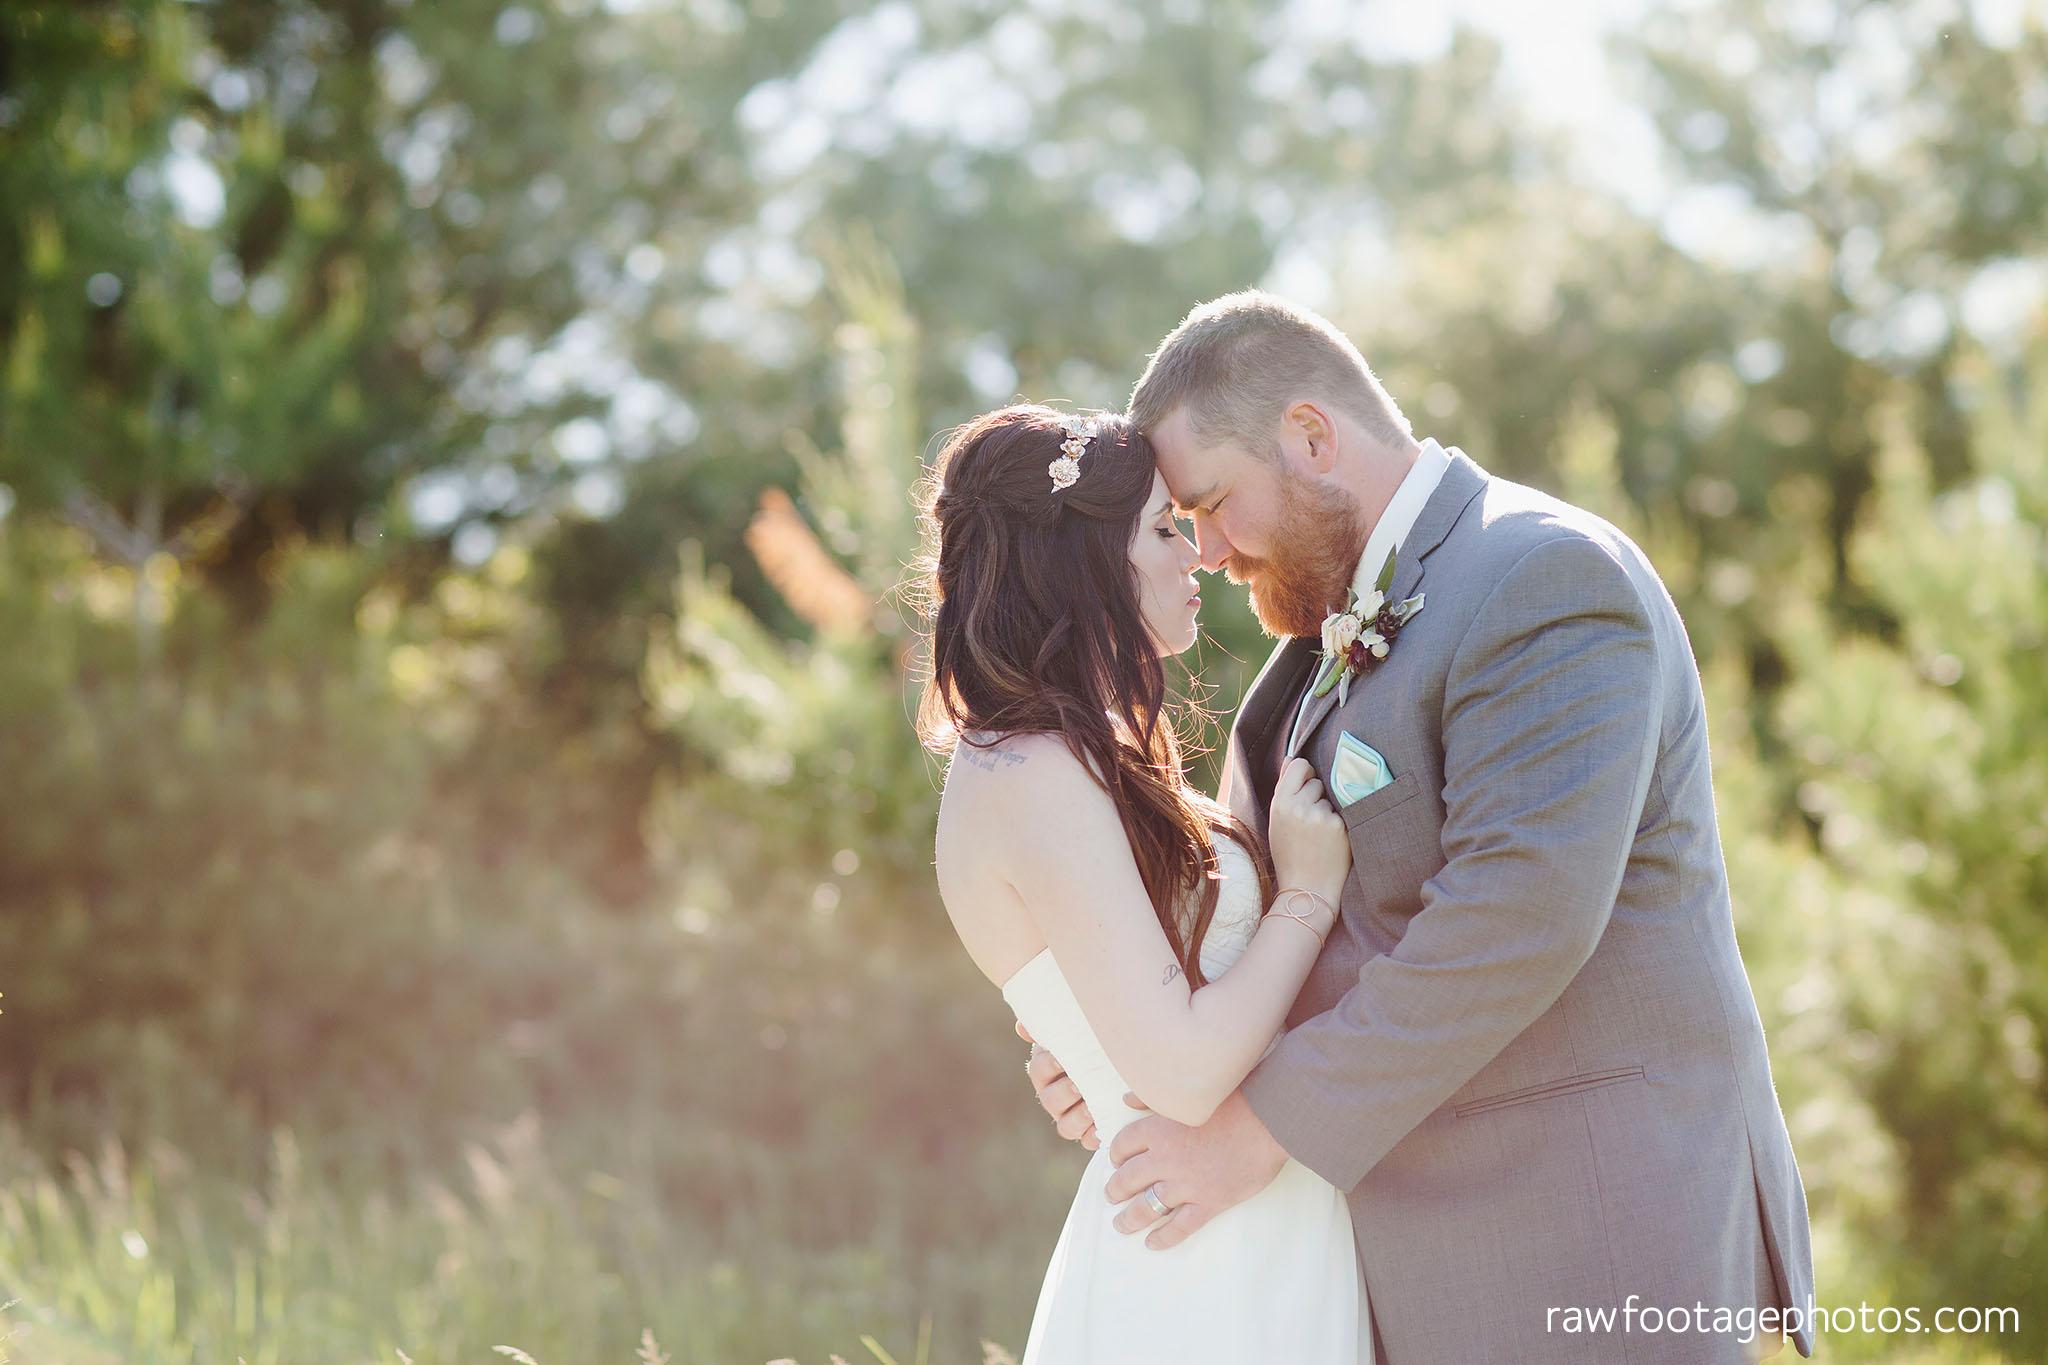 london_ontario_wedding_photographer-century_wedding_barn-raw_footage_photography-diy_wedding081.jpg